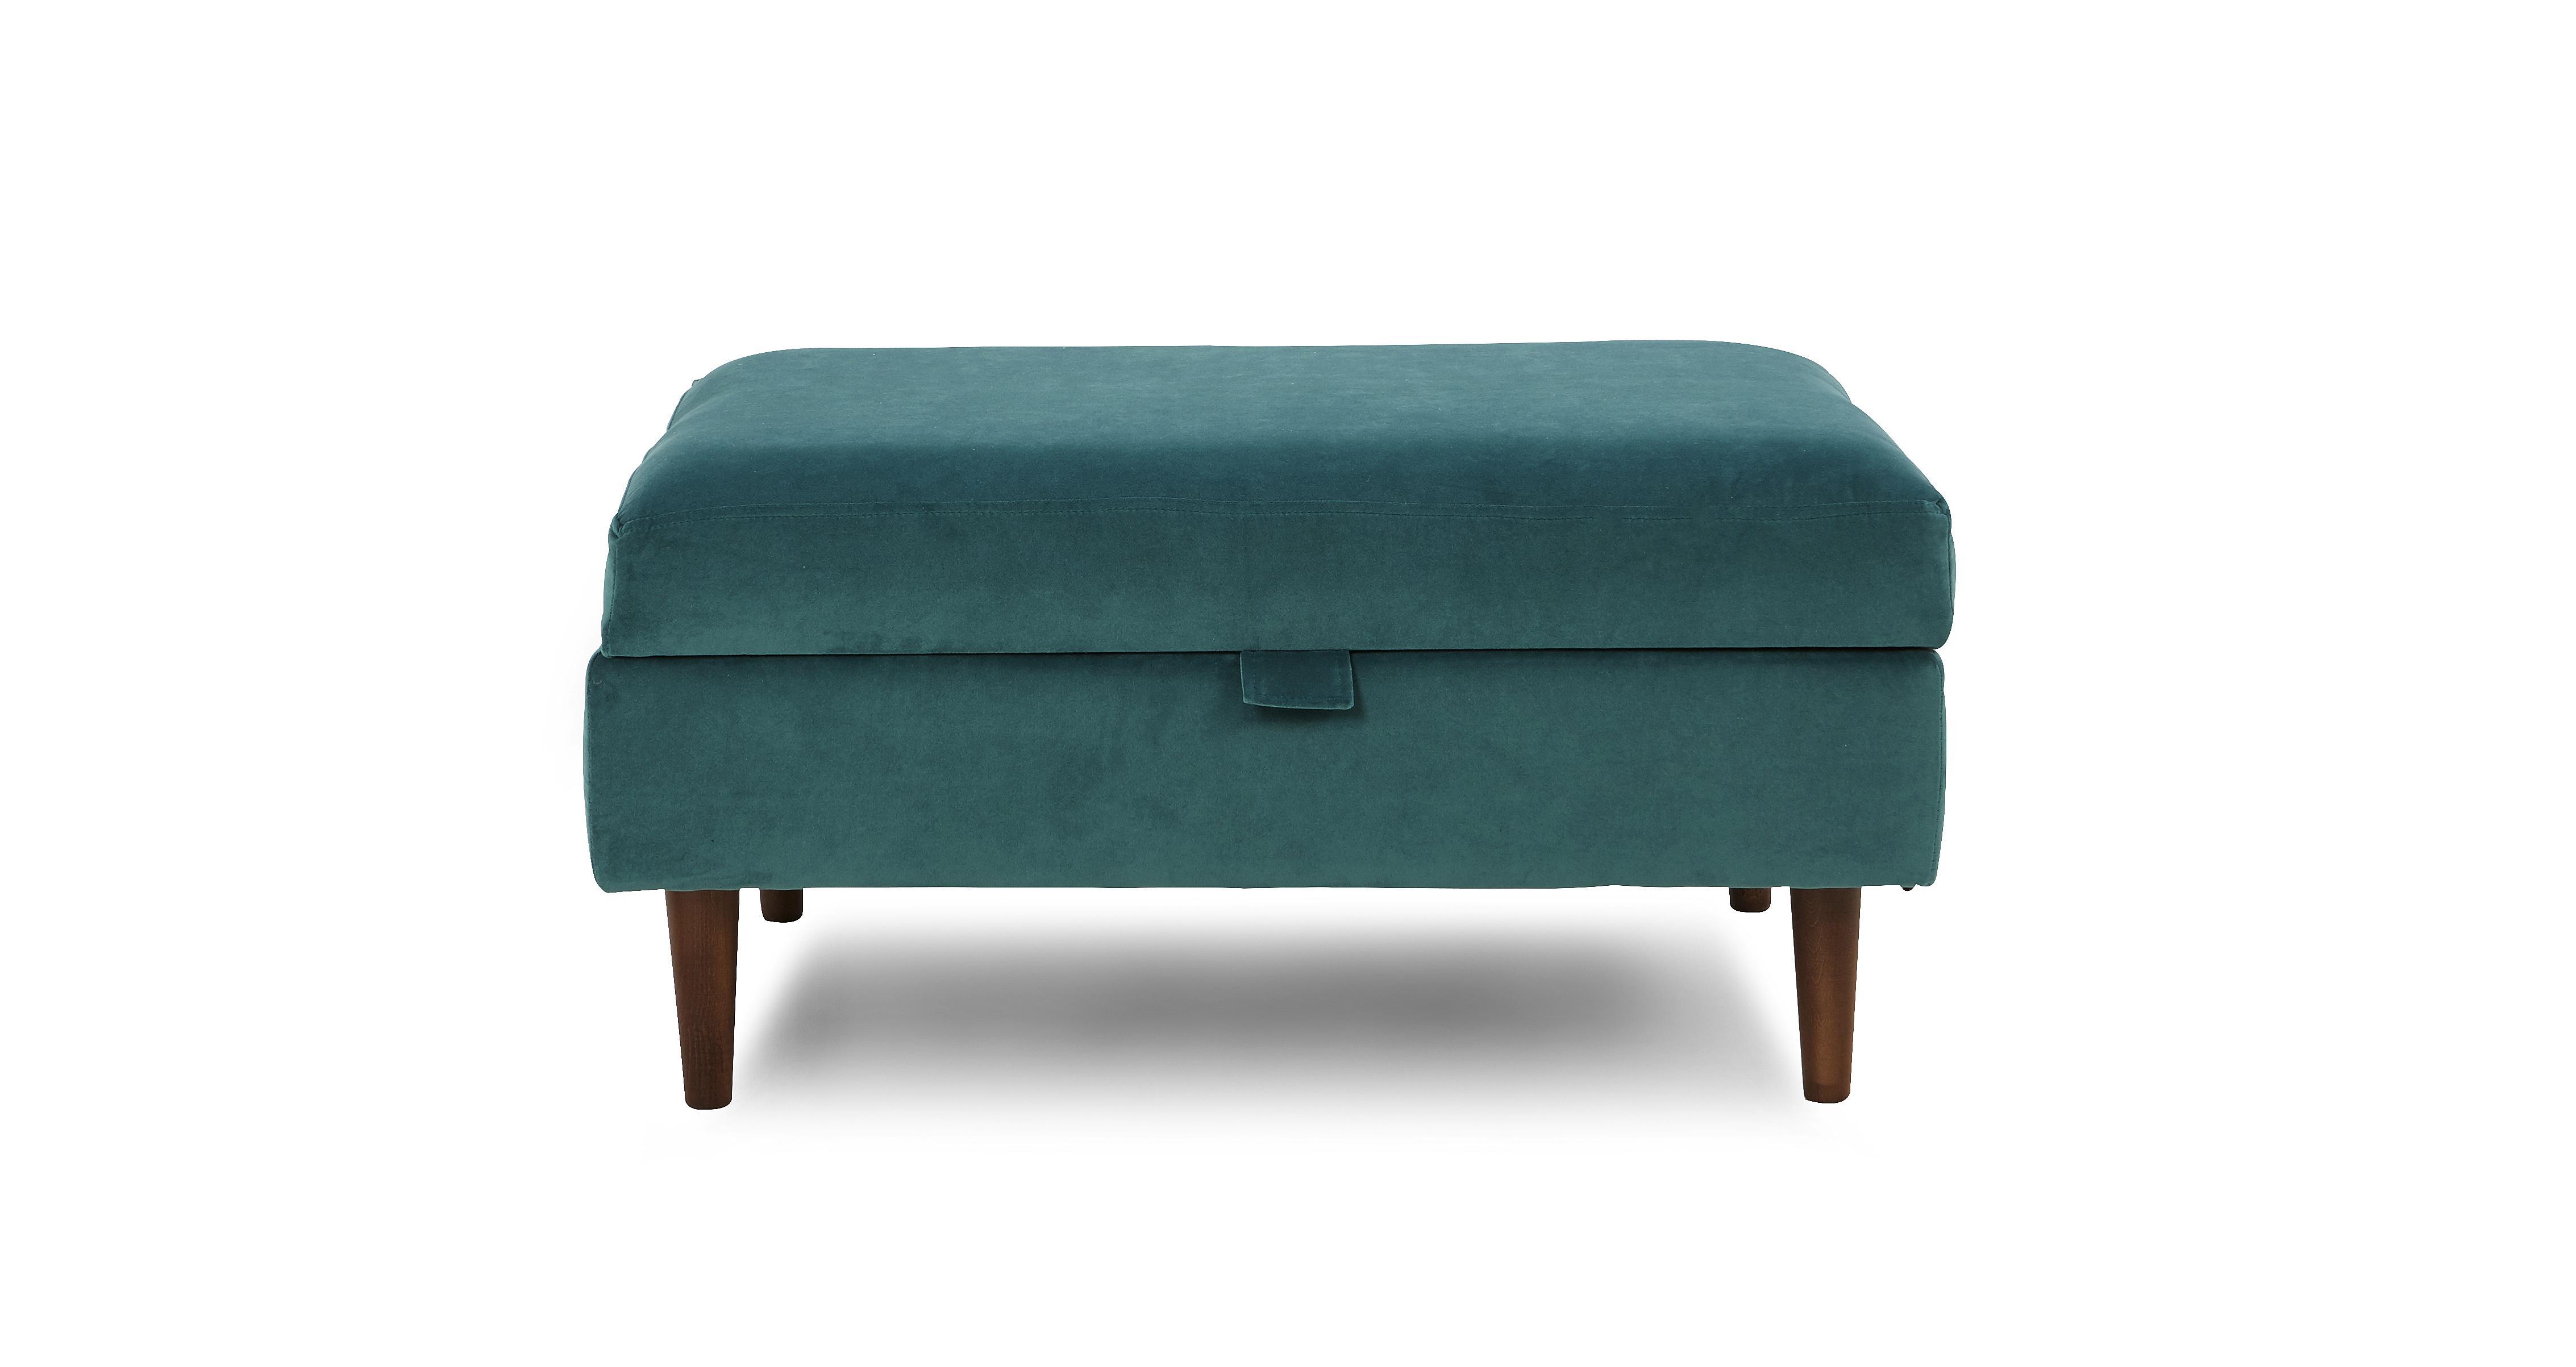 dfs sofa reviews 2018 furniture design eden banquette storage footstool luxe velvet  